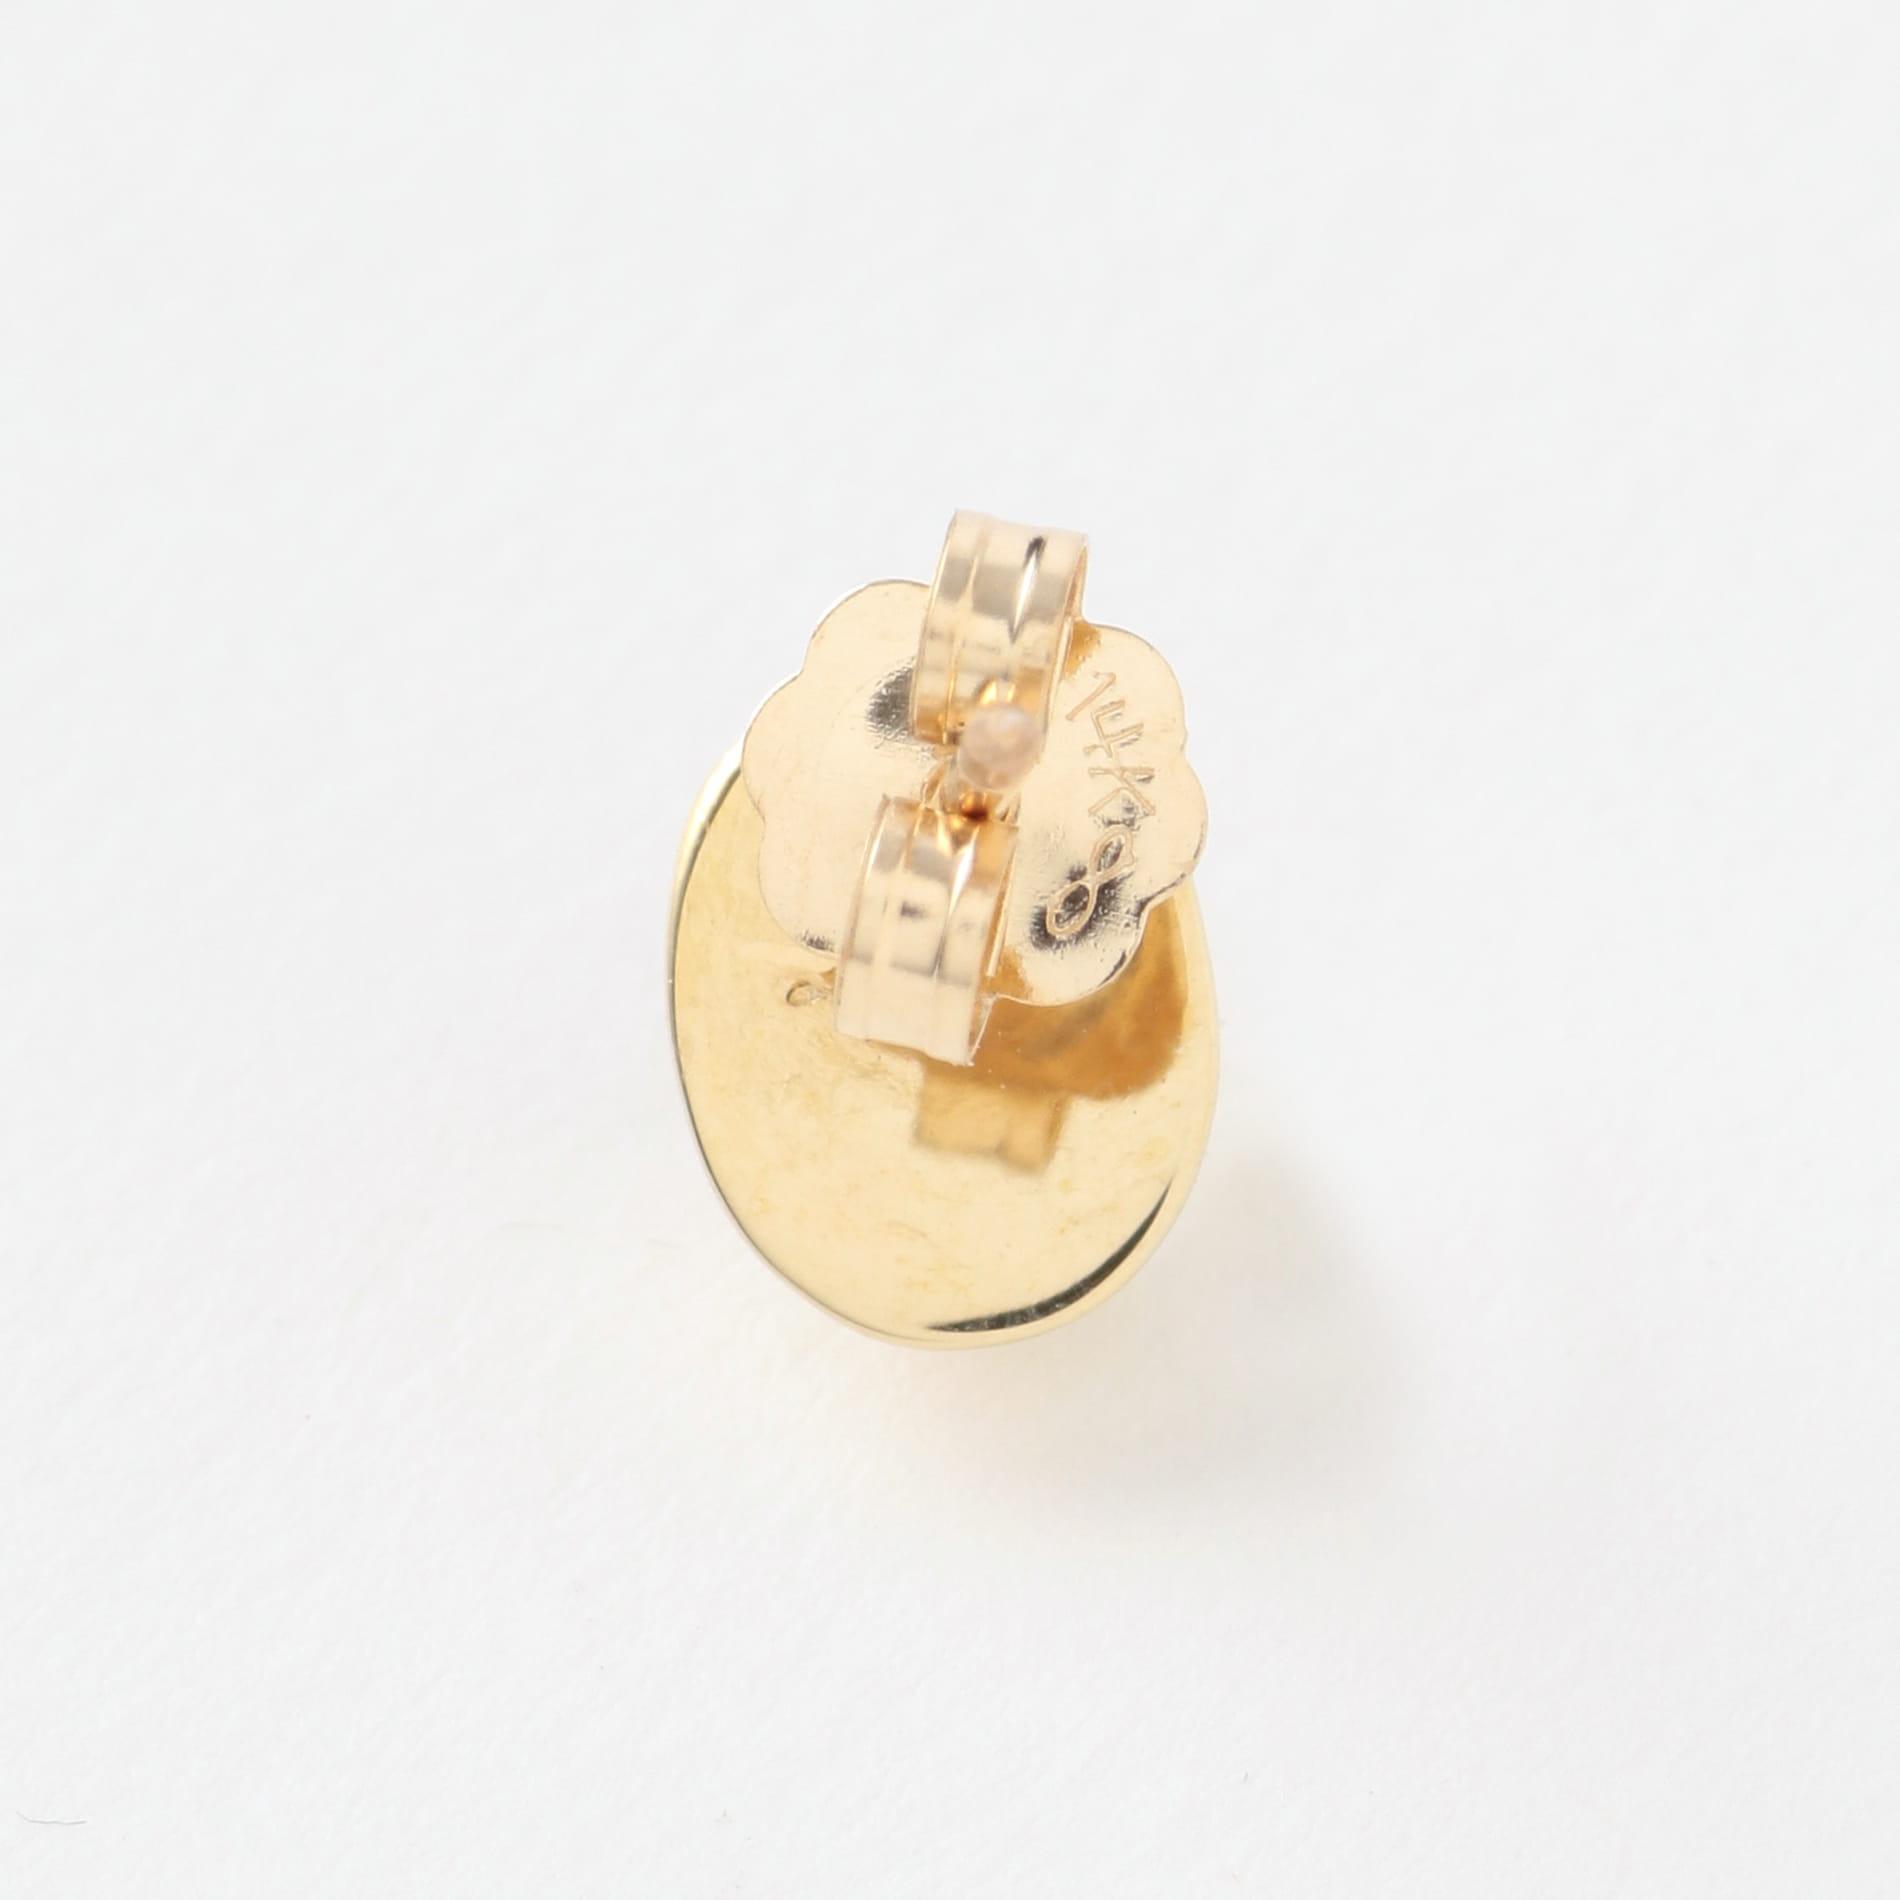 【QUARRY】WOMEN ピアス white pearl / 14K gold(single) Appo white Earring Q17E03